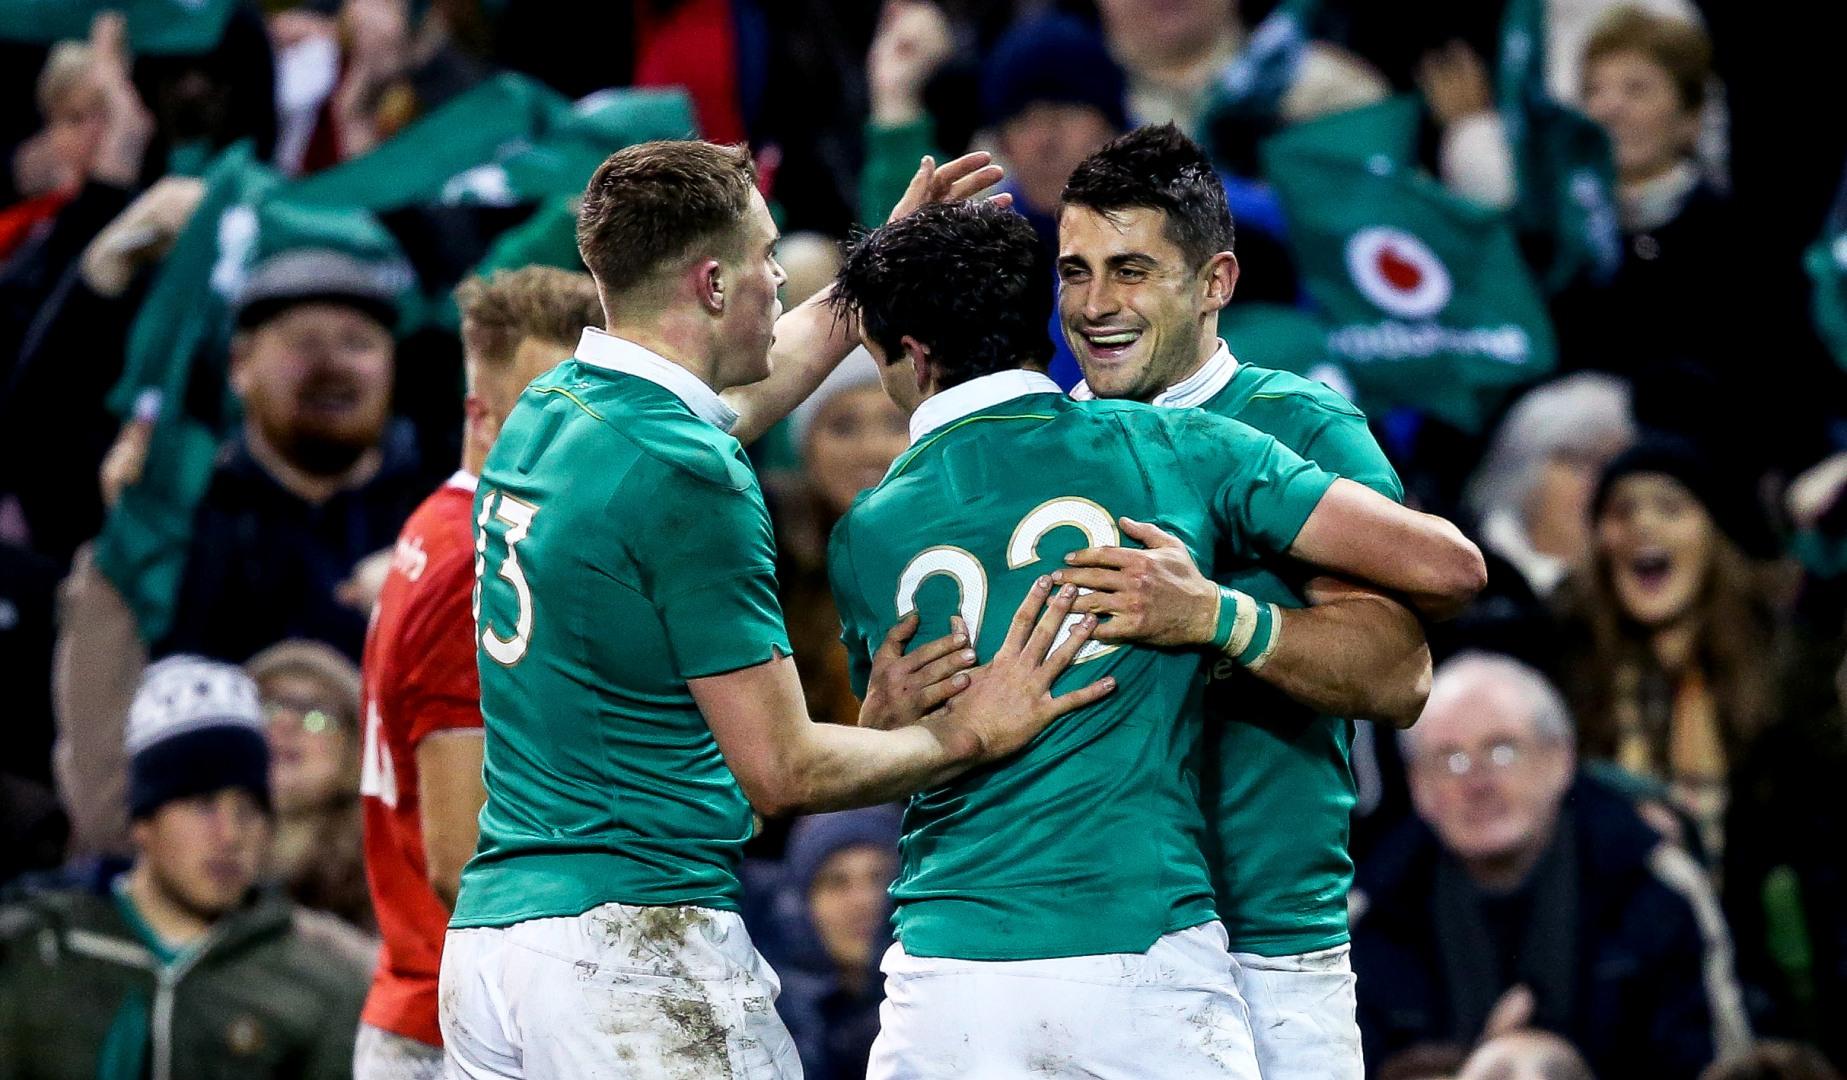 LionsWatch: Ireland display against Canada creates selection headaches